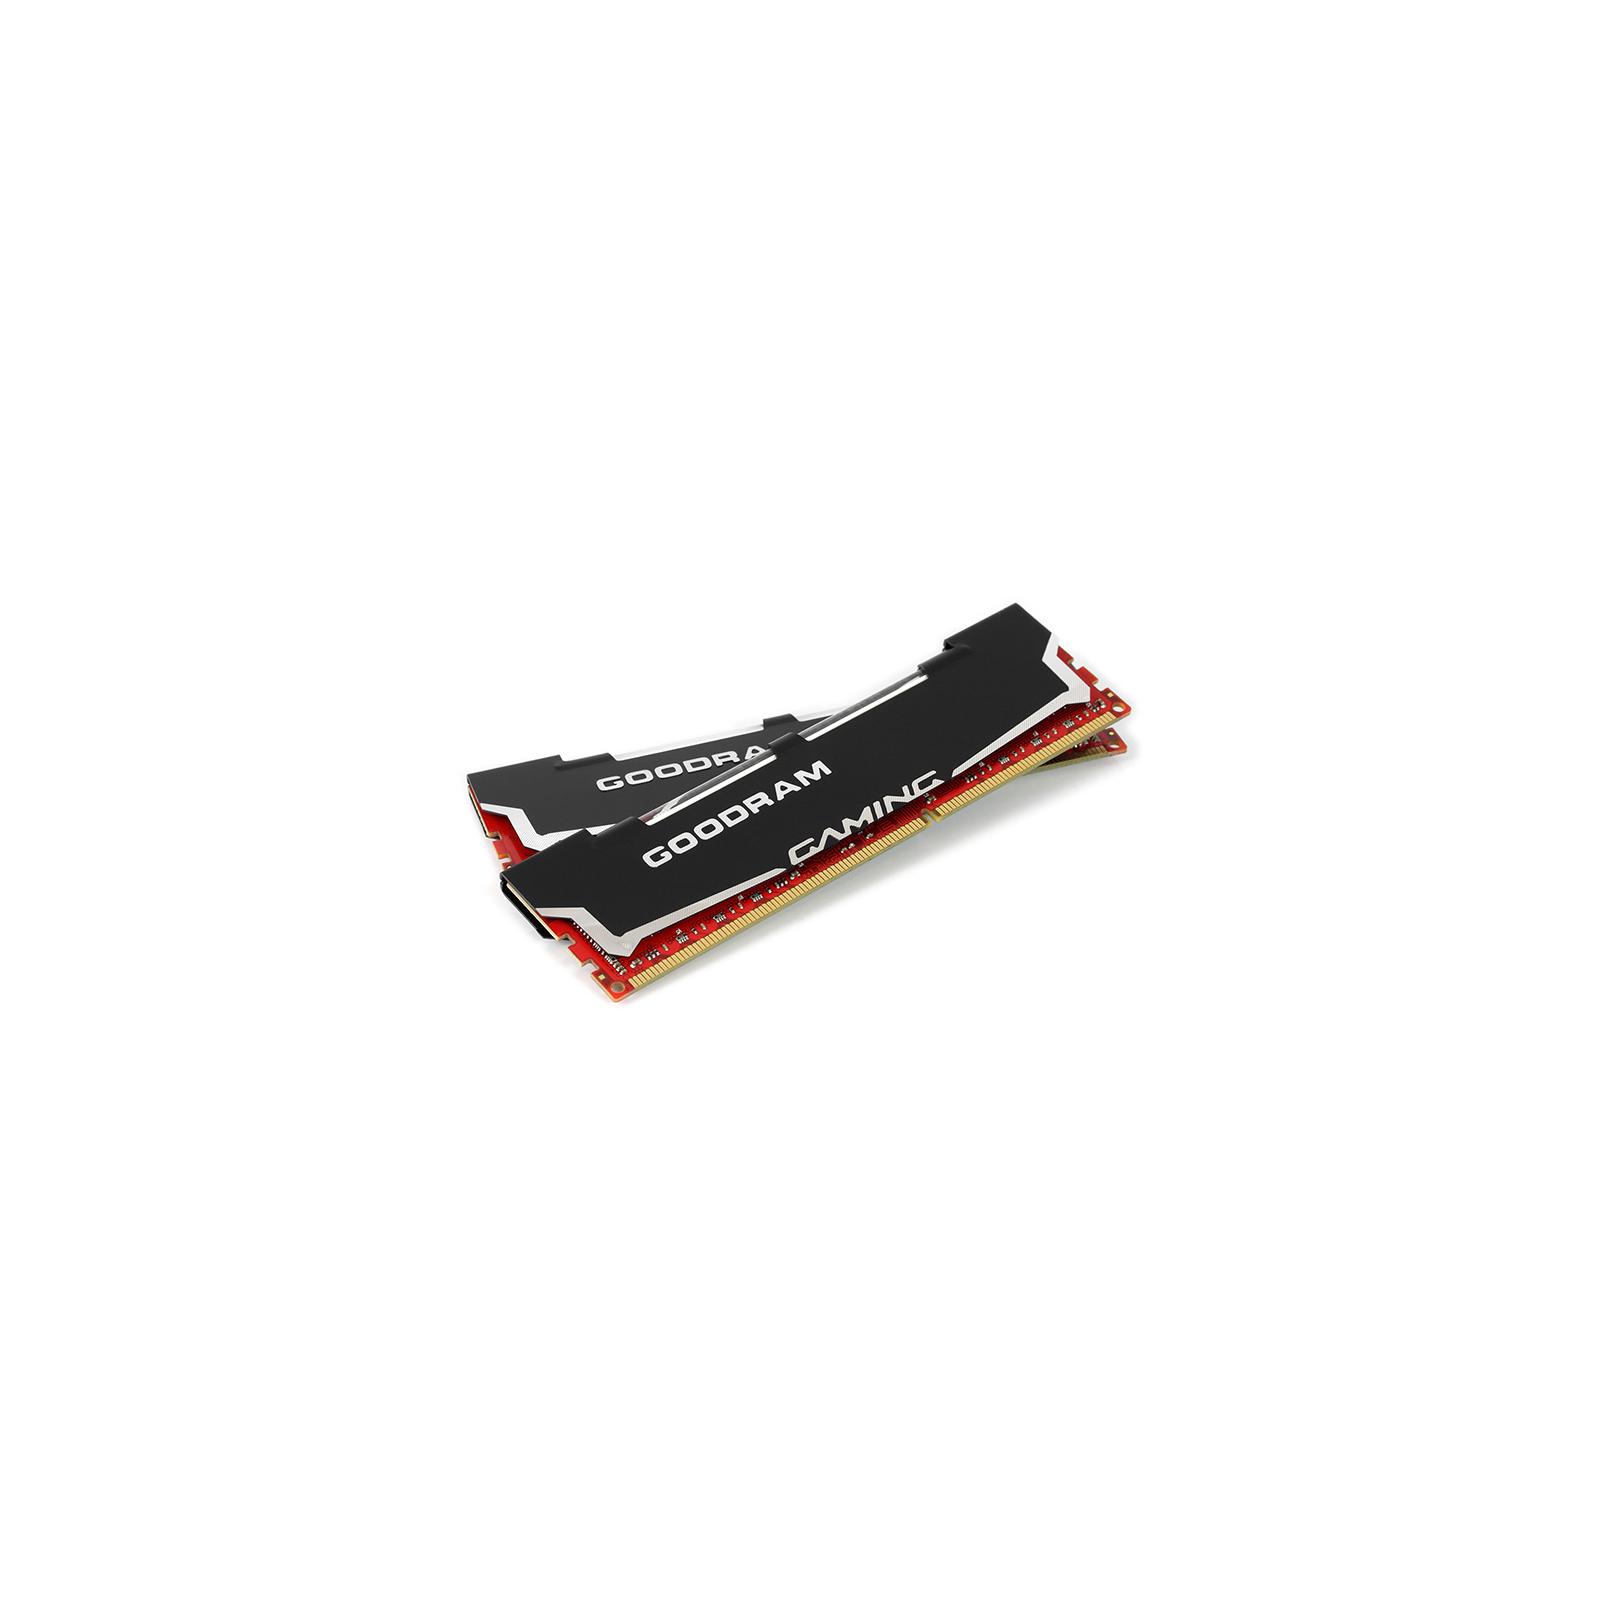 Модуль памяти для компьютера DDR3 8GB (2x4GB) 1600 MHz Led Gaming GOODRAM (GL1600D364L9S/8GDC) изображение 2